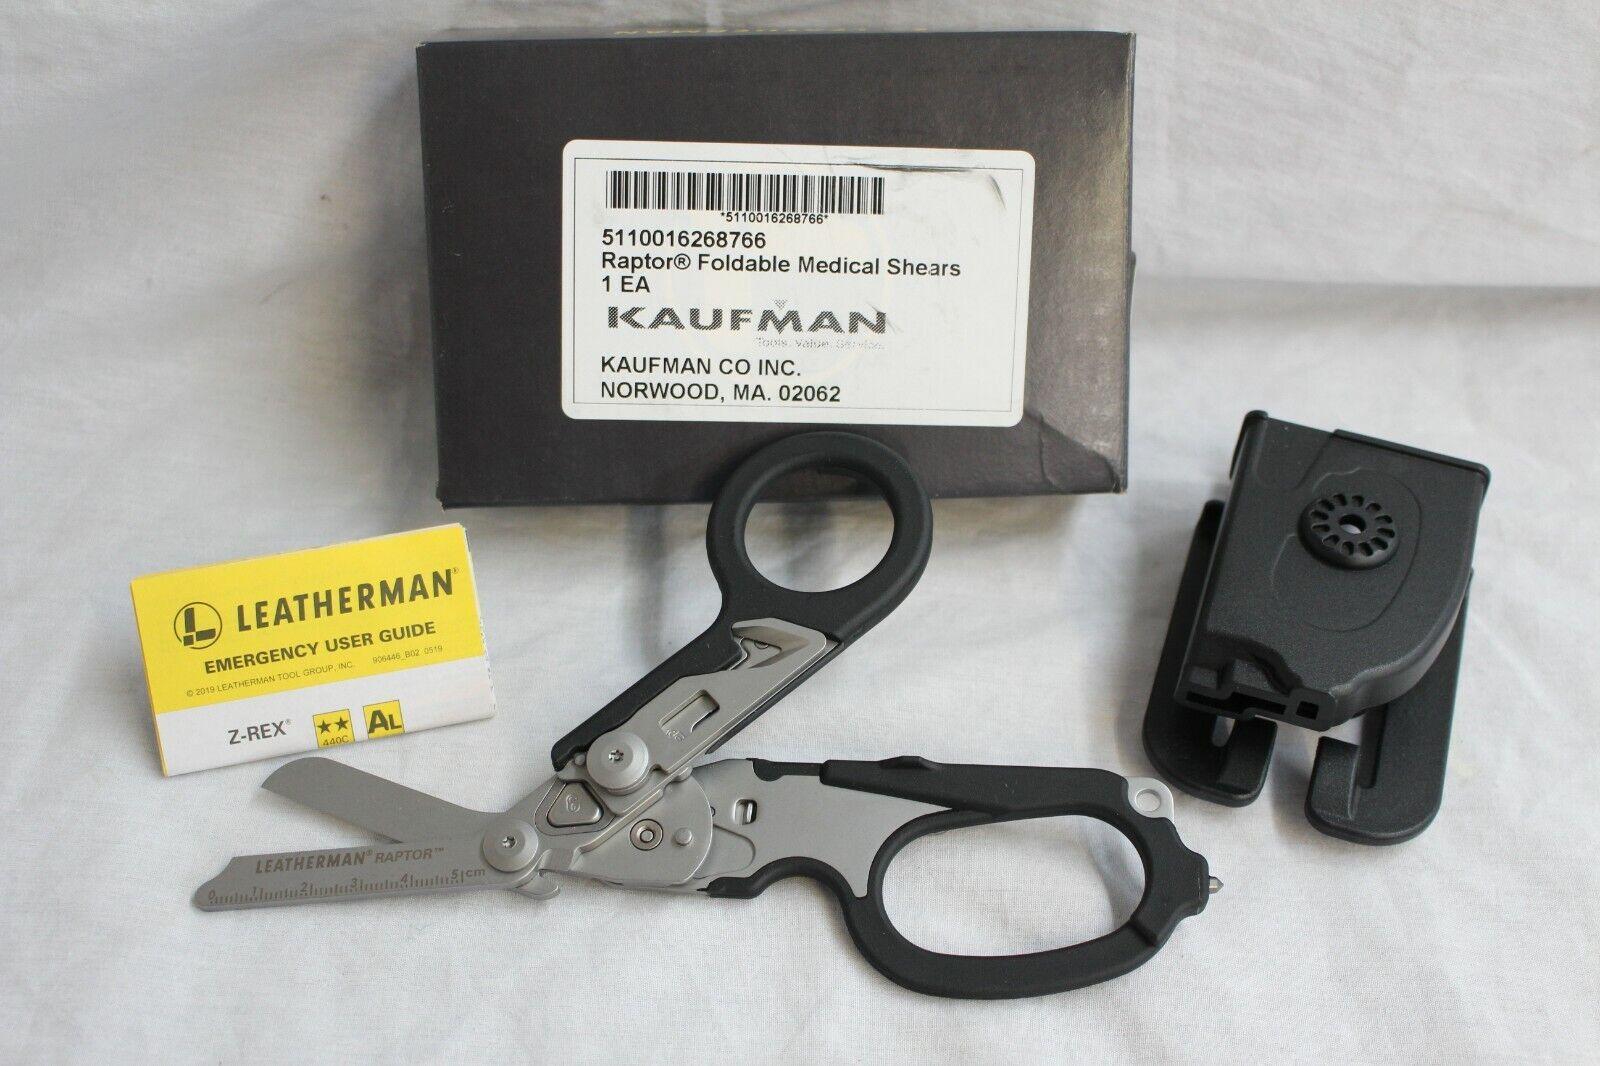 LEATHERMAN RAPTOR FOLDABLE MEDICAL SHEARS W/ HOLSTER - NEW I